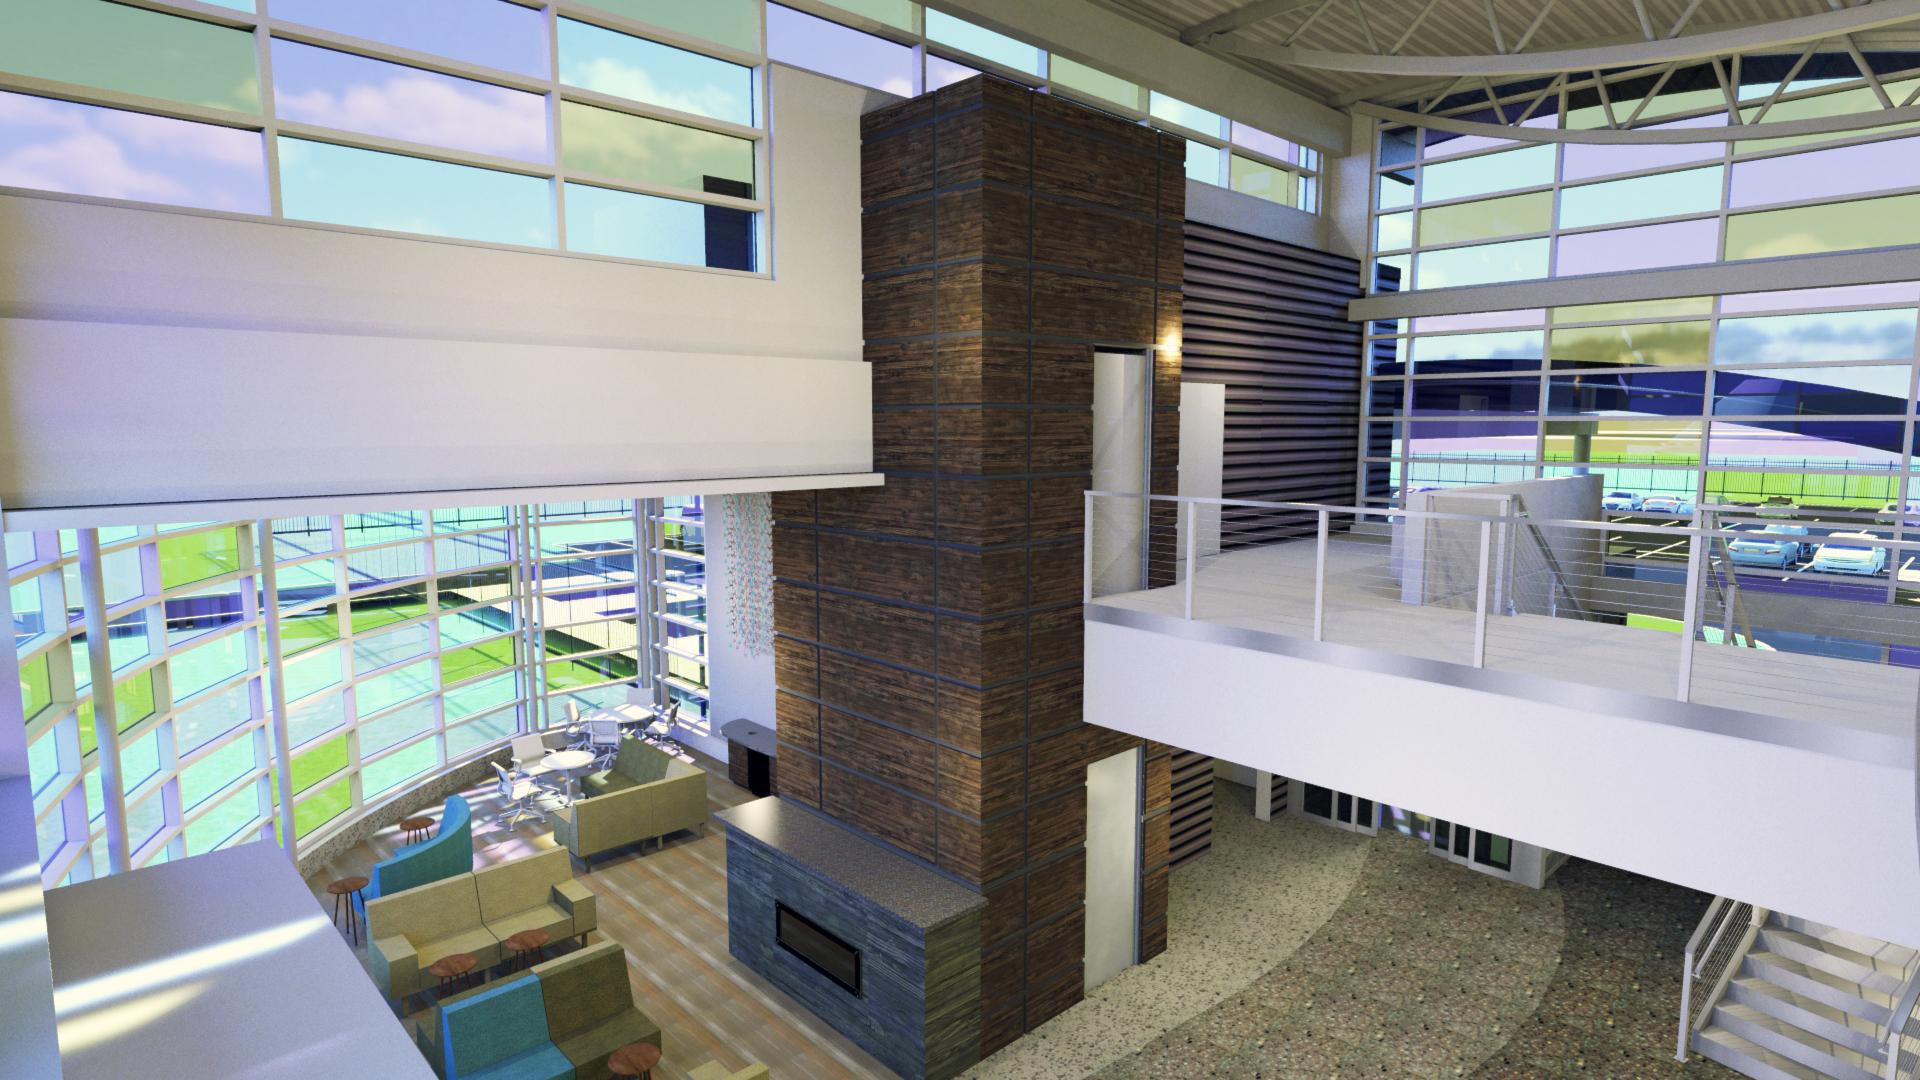 Business Spotlight Fort Wayne Aero Center FBO and Business